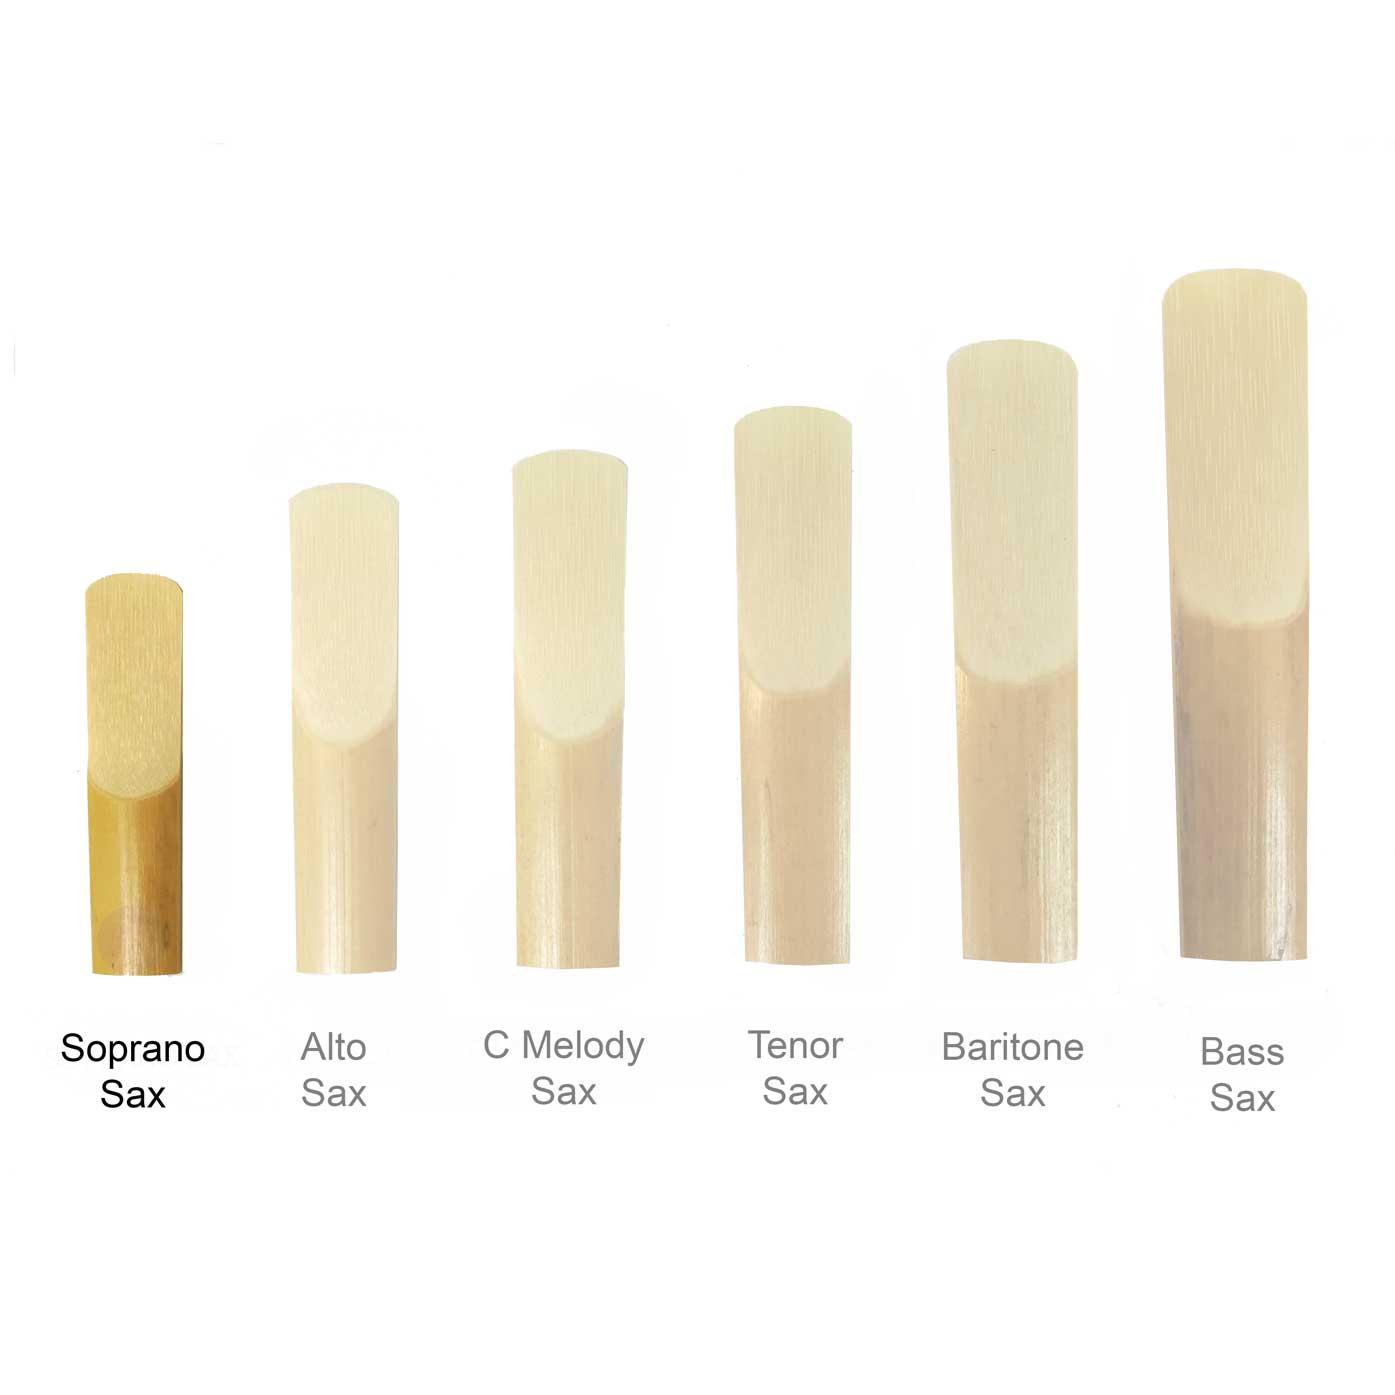 Maccaferri-Sax-Reeds-All-Sizes-soprano-sax-reeds.jpg